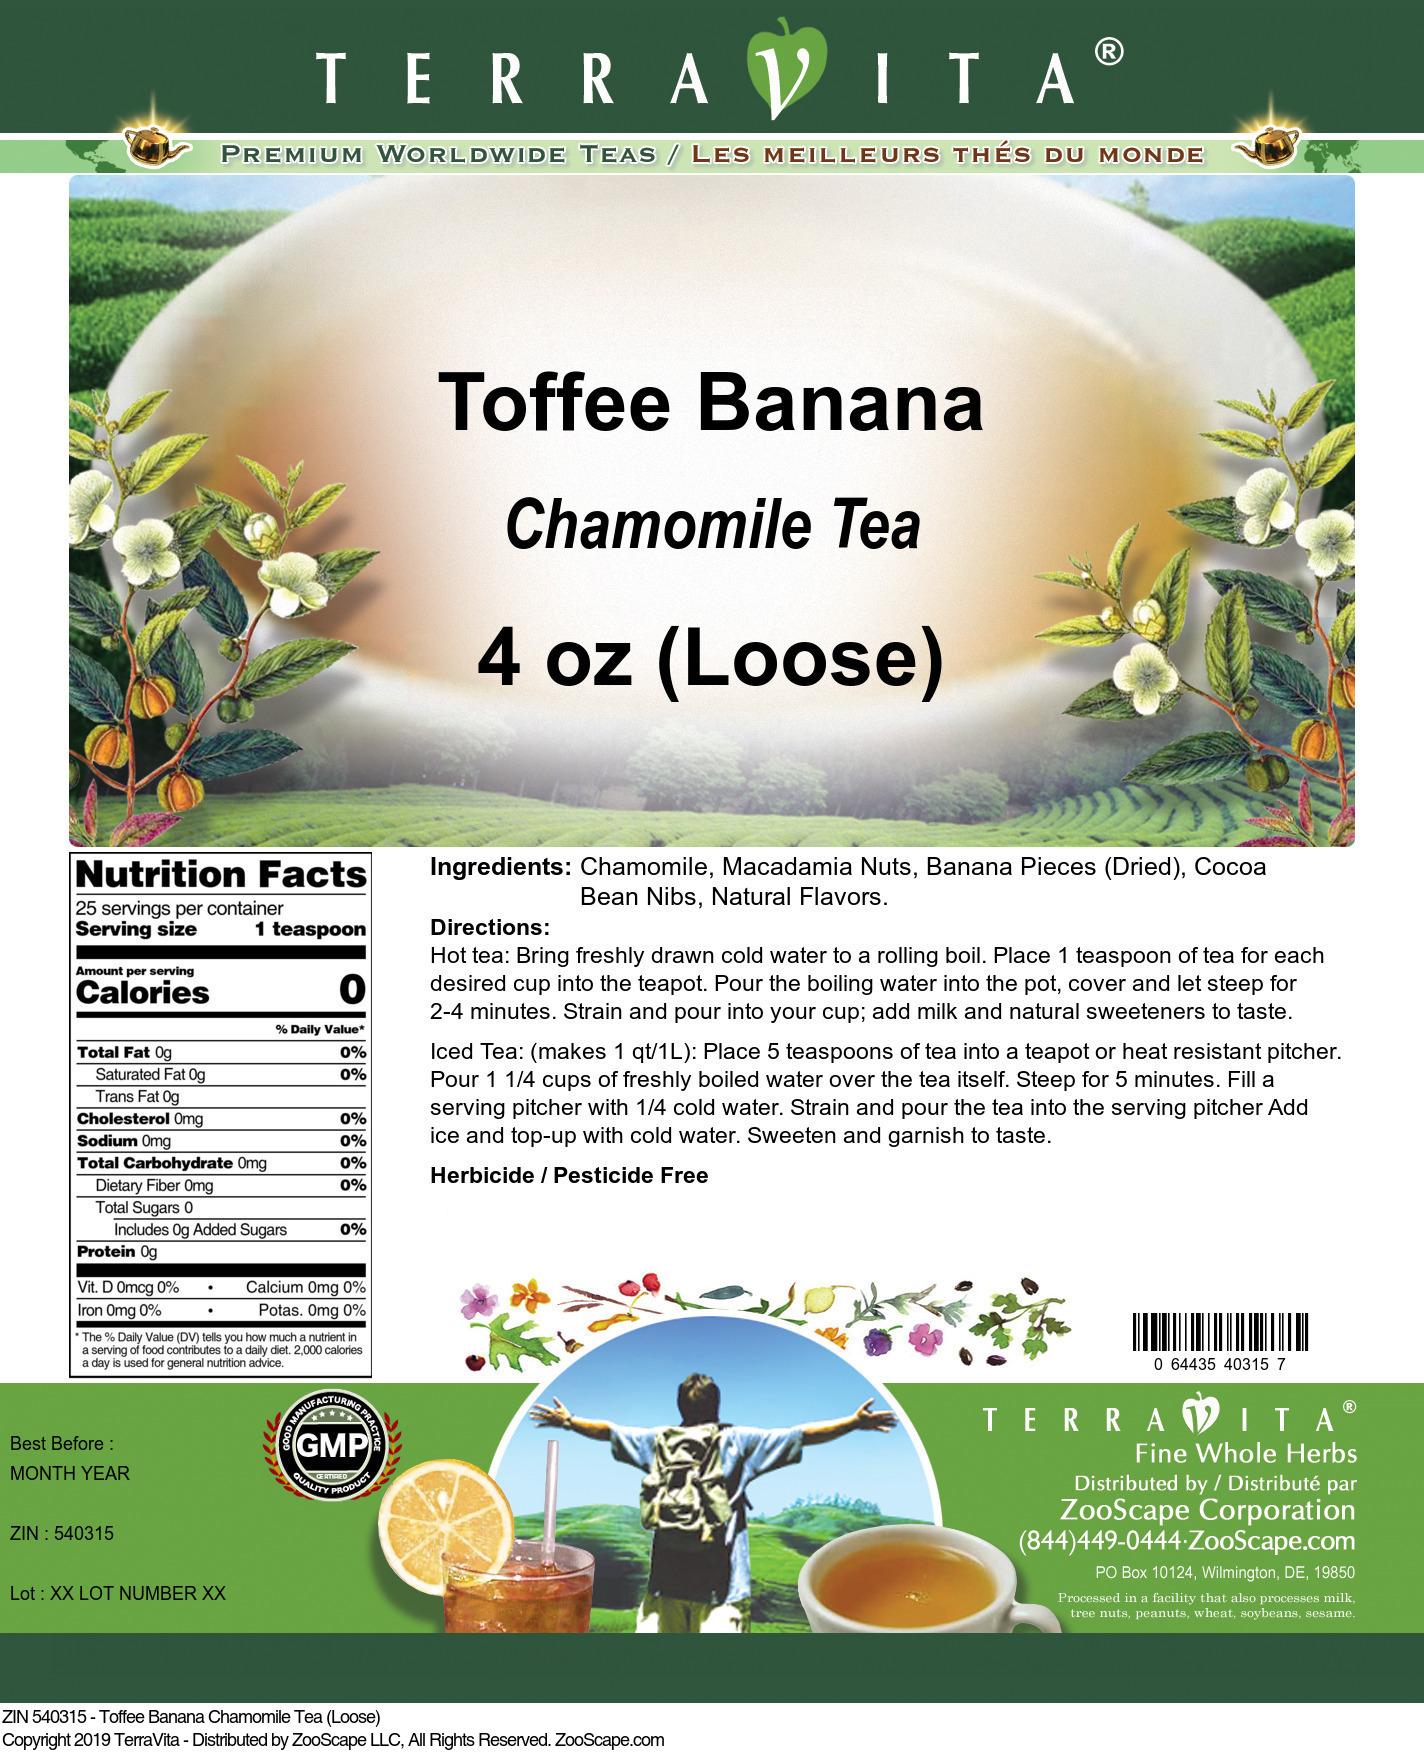 Toffee Banana Chamomile Tea (Loose)